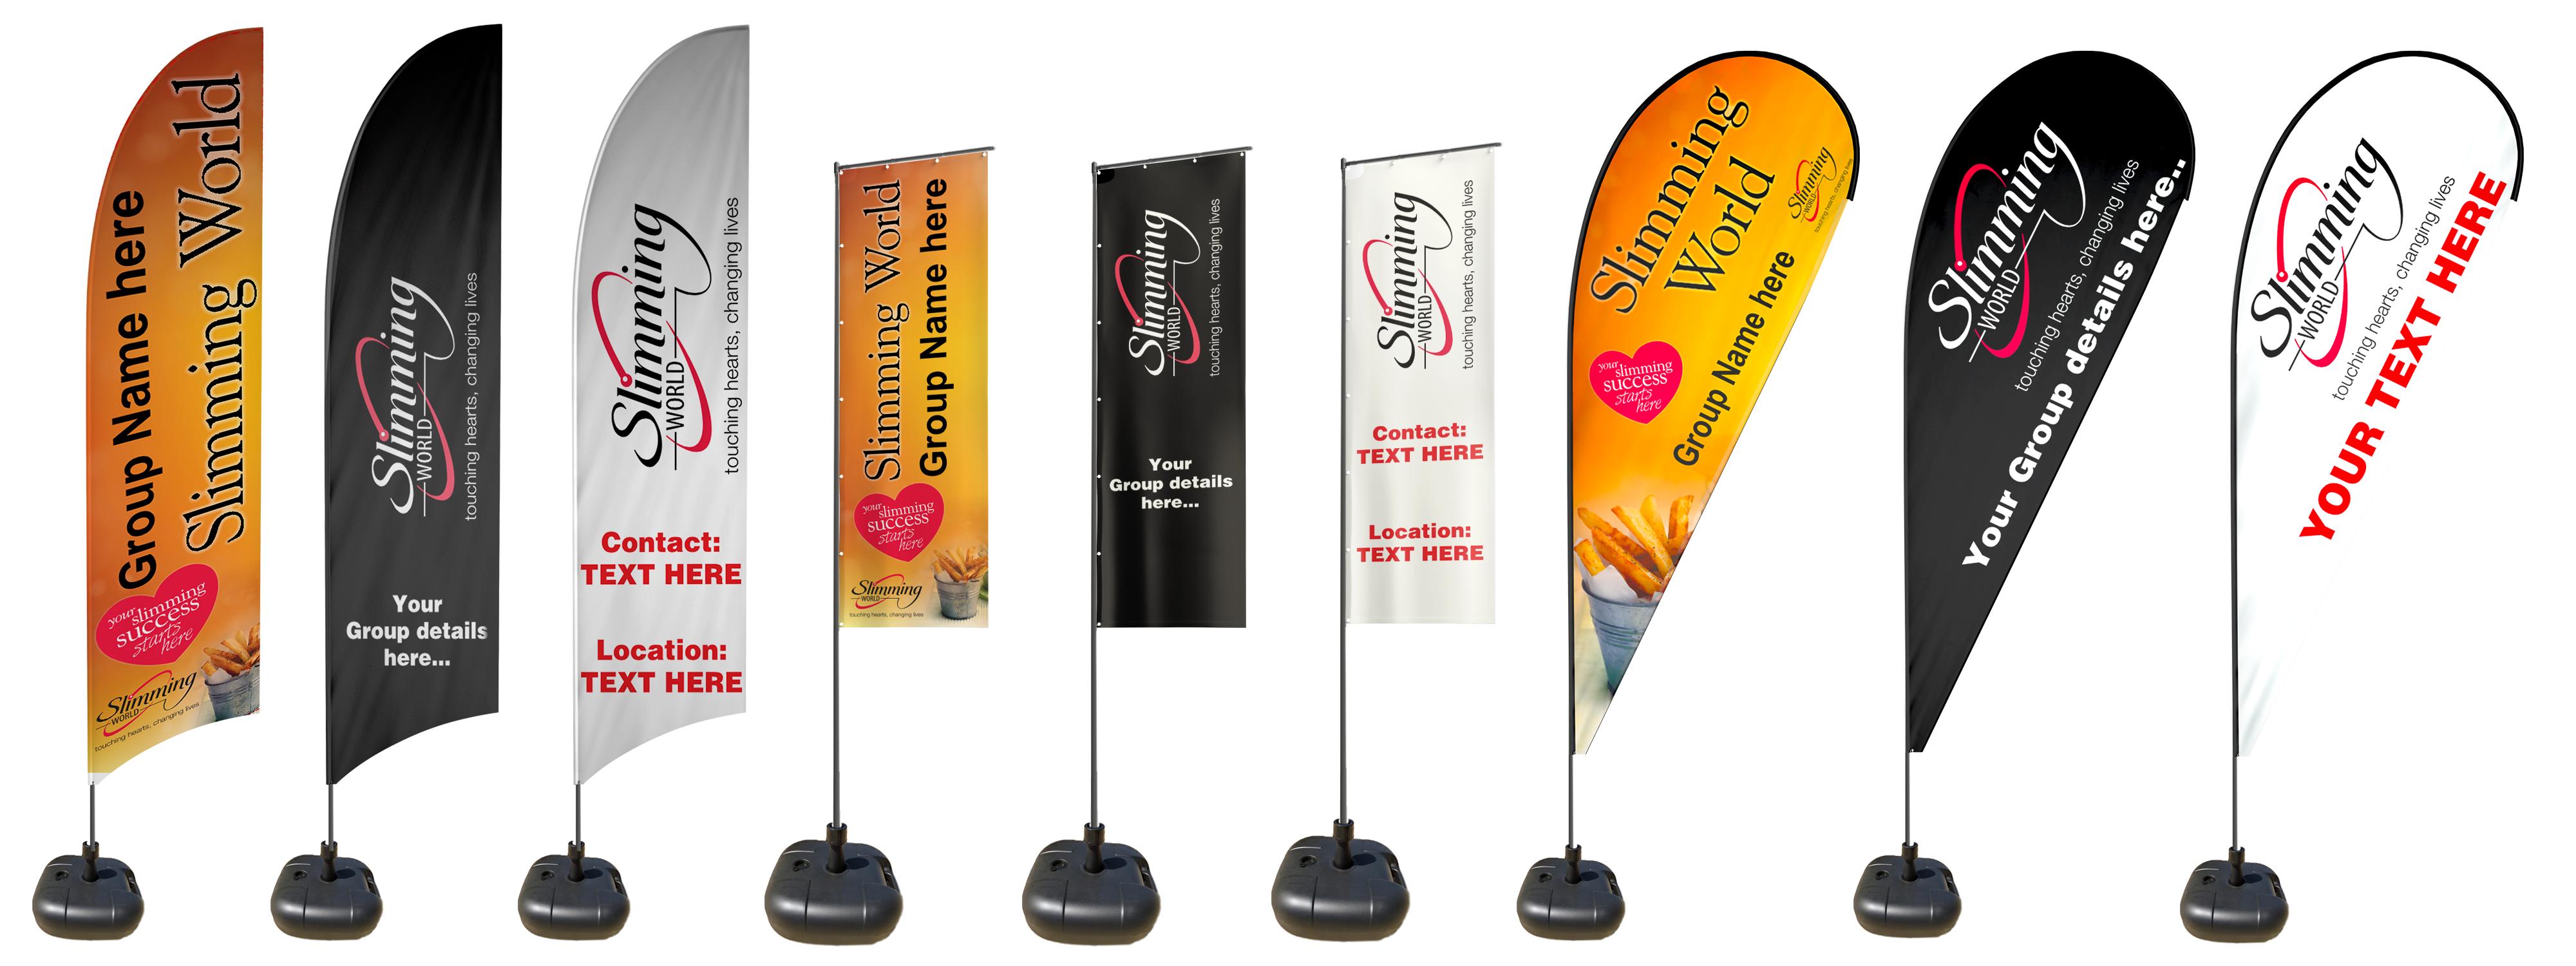 Custom Slimming World Flags